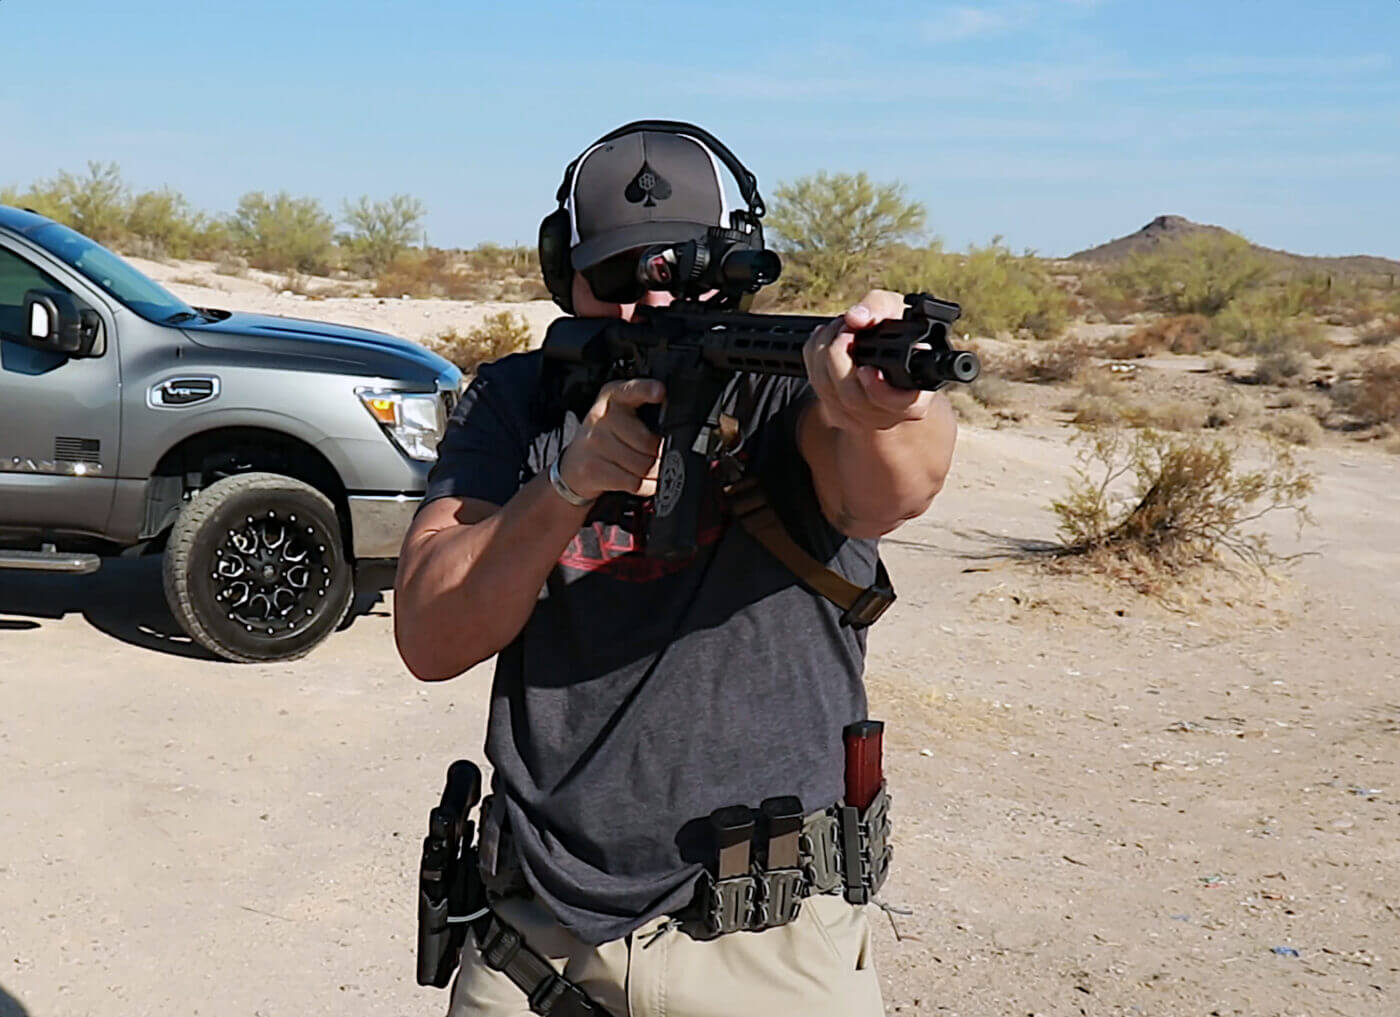 Man testing the Riton optic on the range with a SAINT Victor rifle